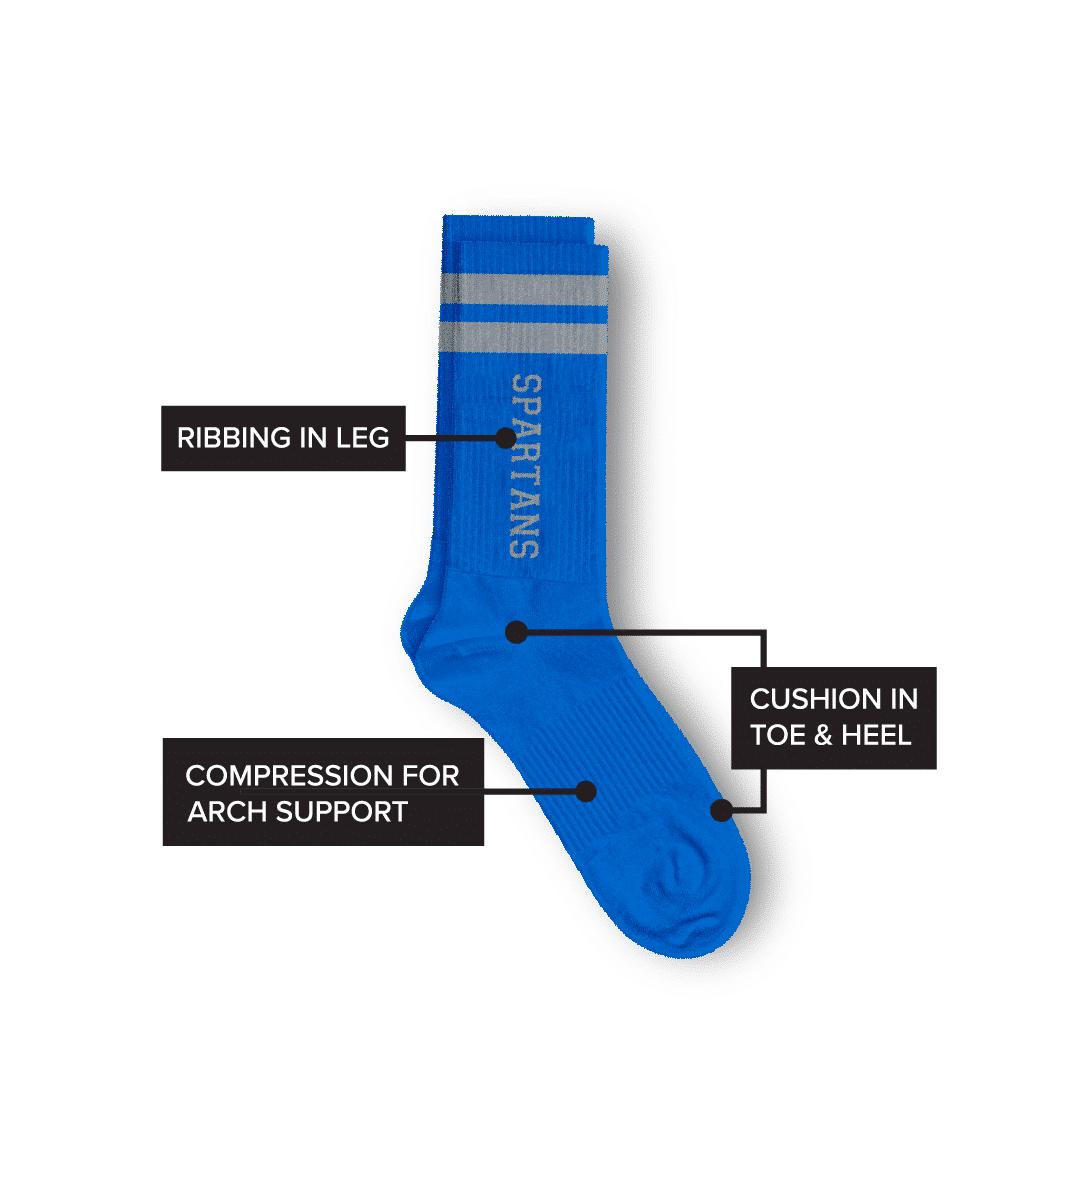 Fashion accessory - Product design